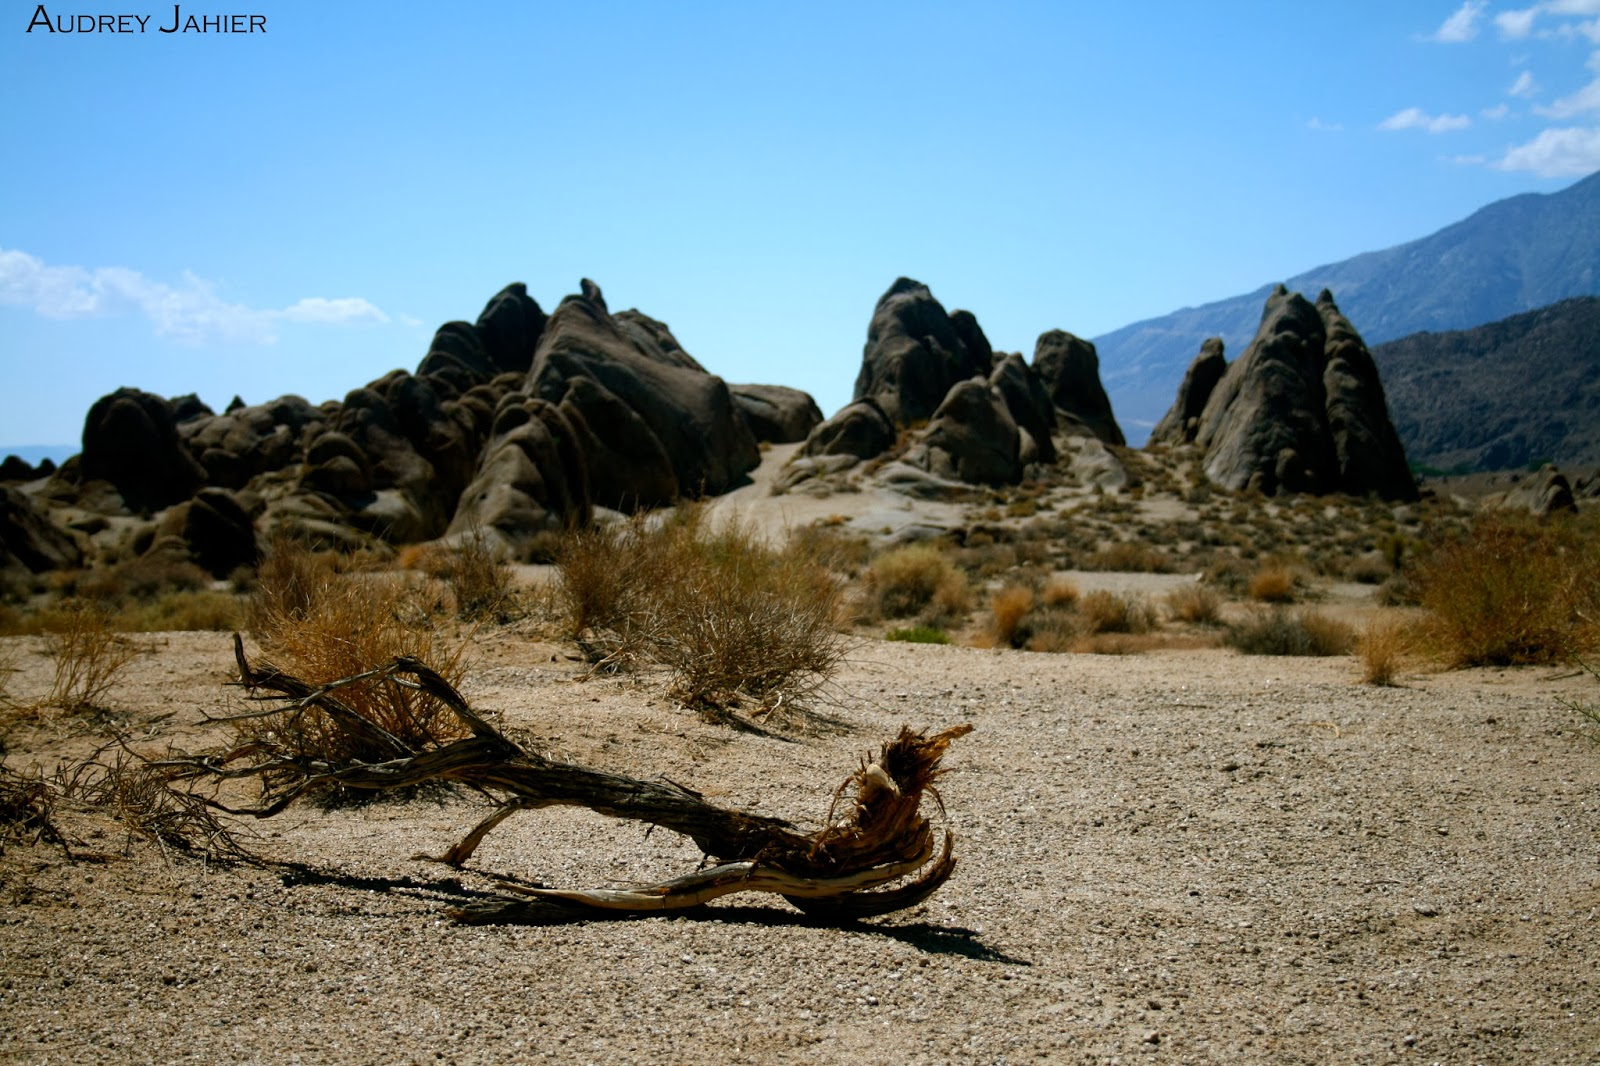 lone-pine-western-road-trip-USA